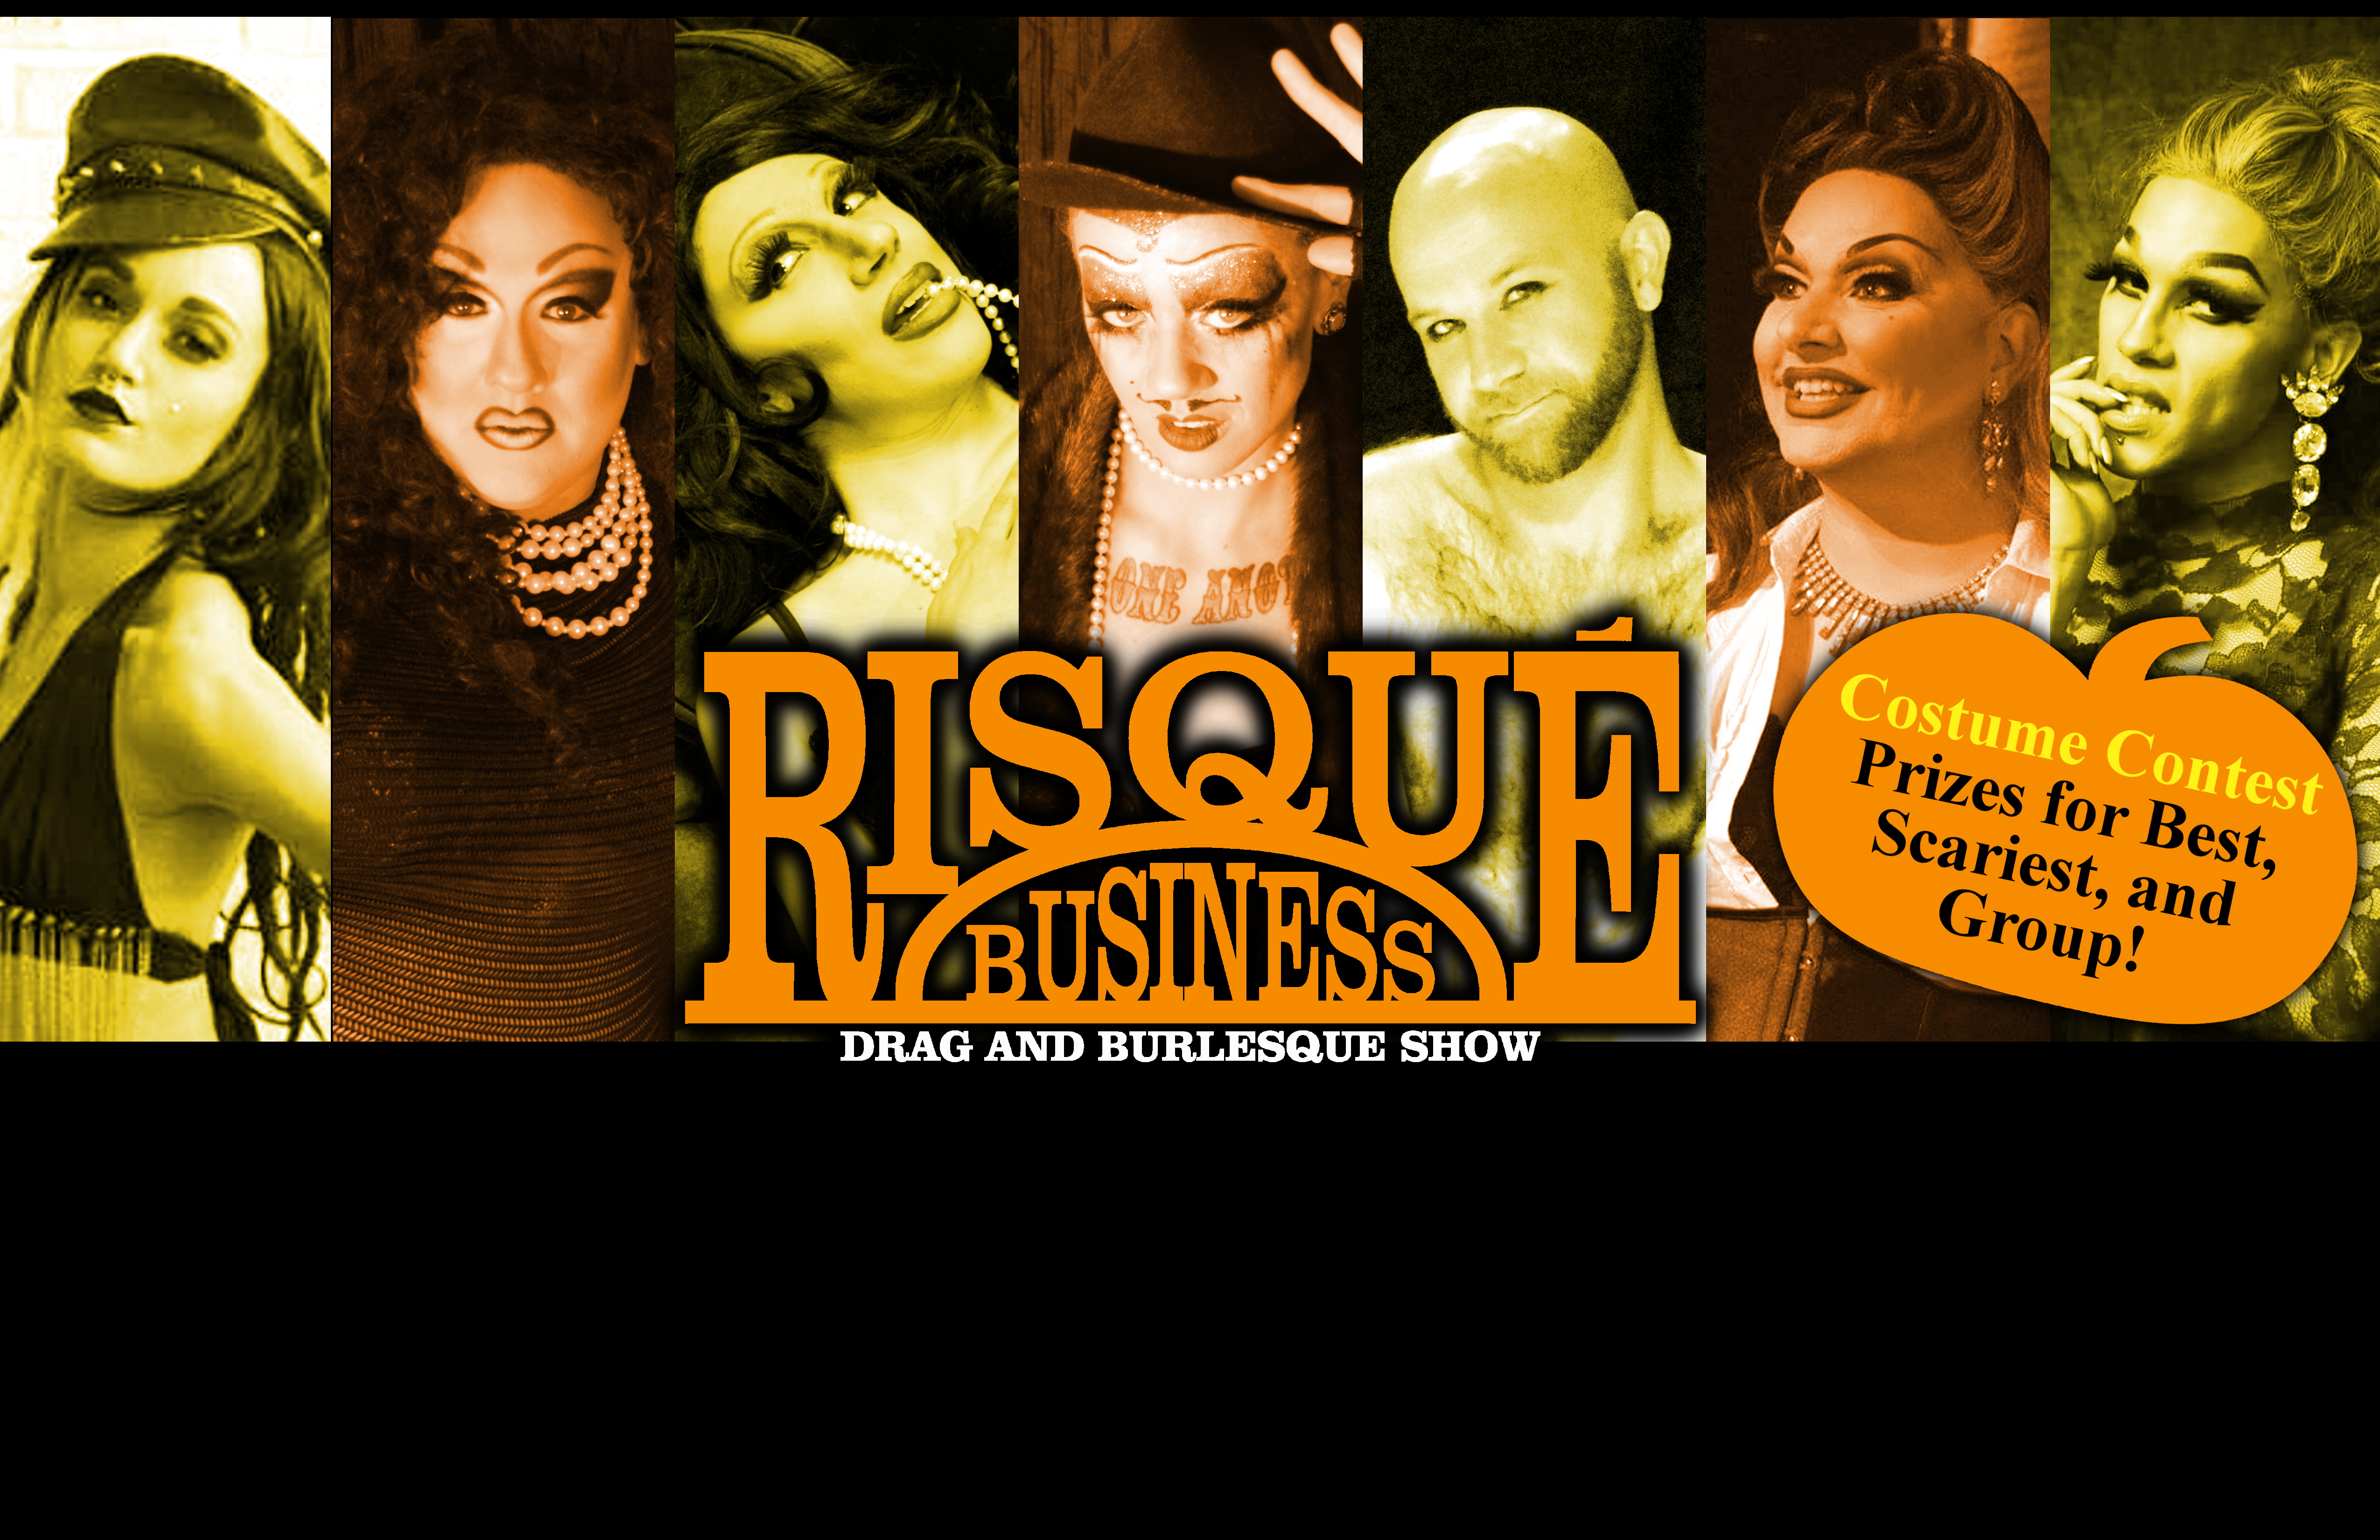 Risque Business Halloween Drag & Burlesque Show @ River City Blues Club & Dart Room | Harrisburg | Pennsylvania | United States